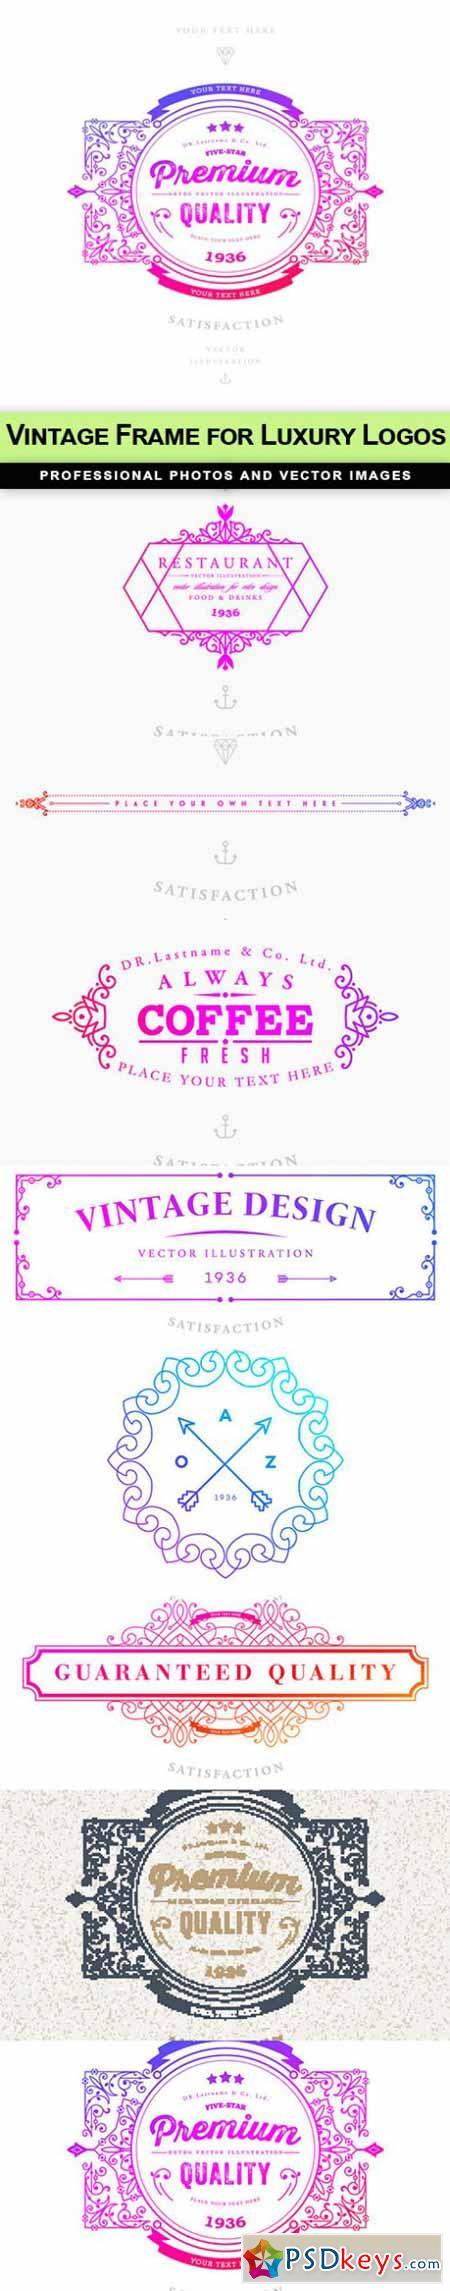 Vintage Frame for Luxury Logos - 8 EPS